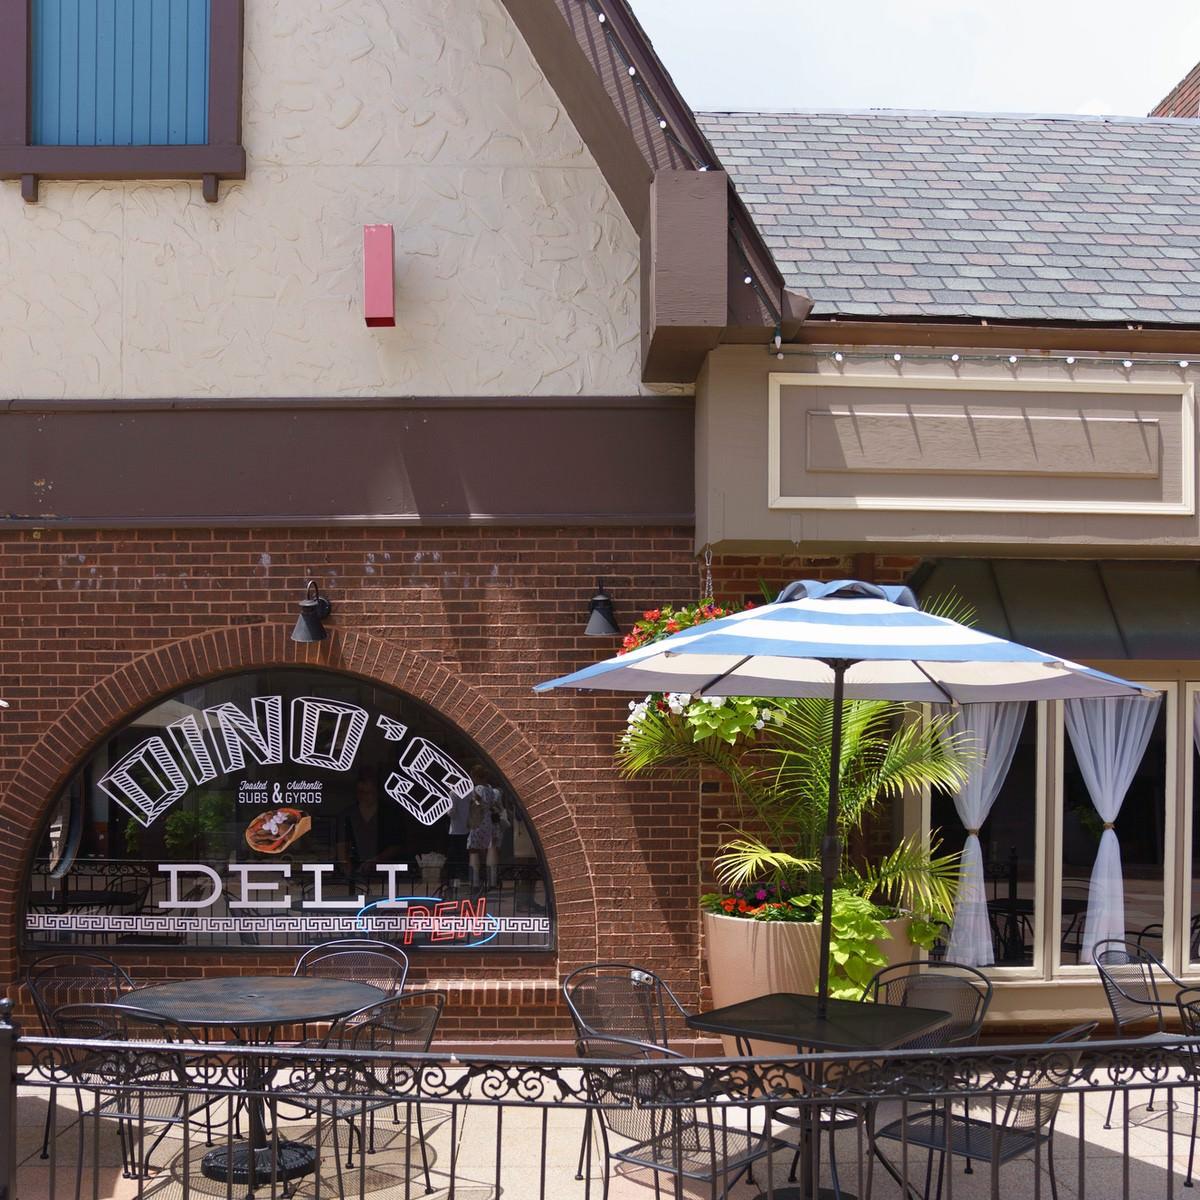 Dino's Deli Westport Plaza